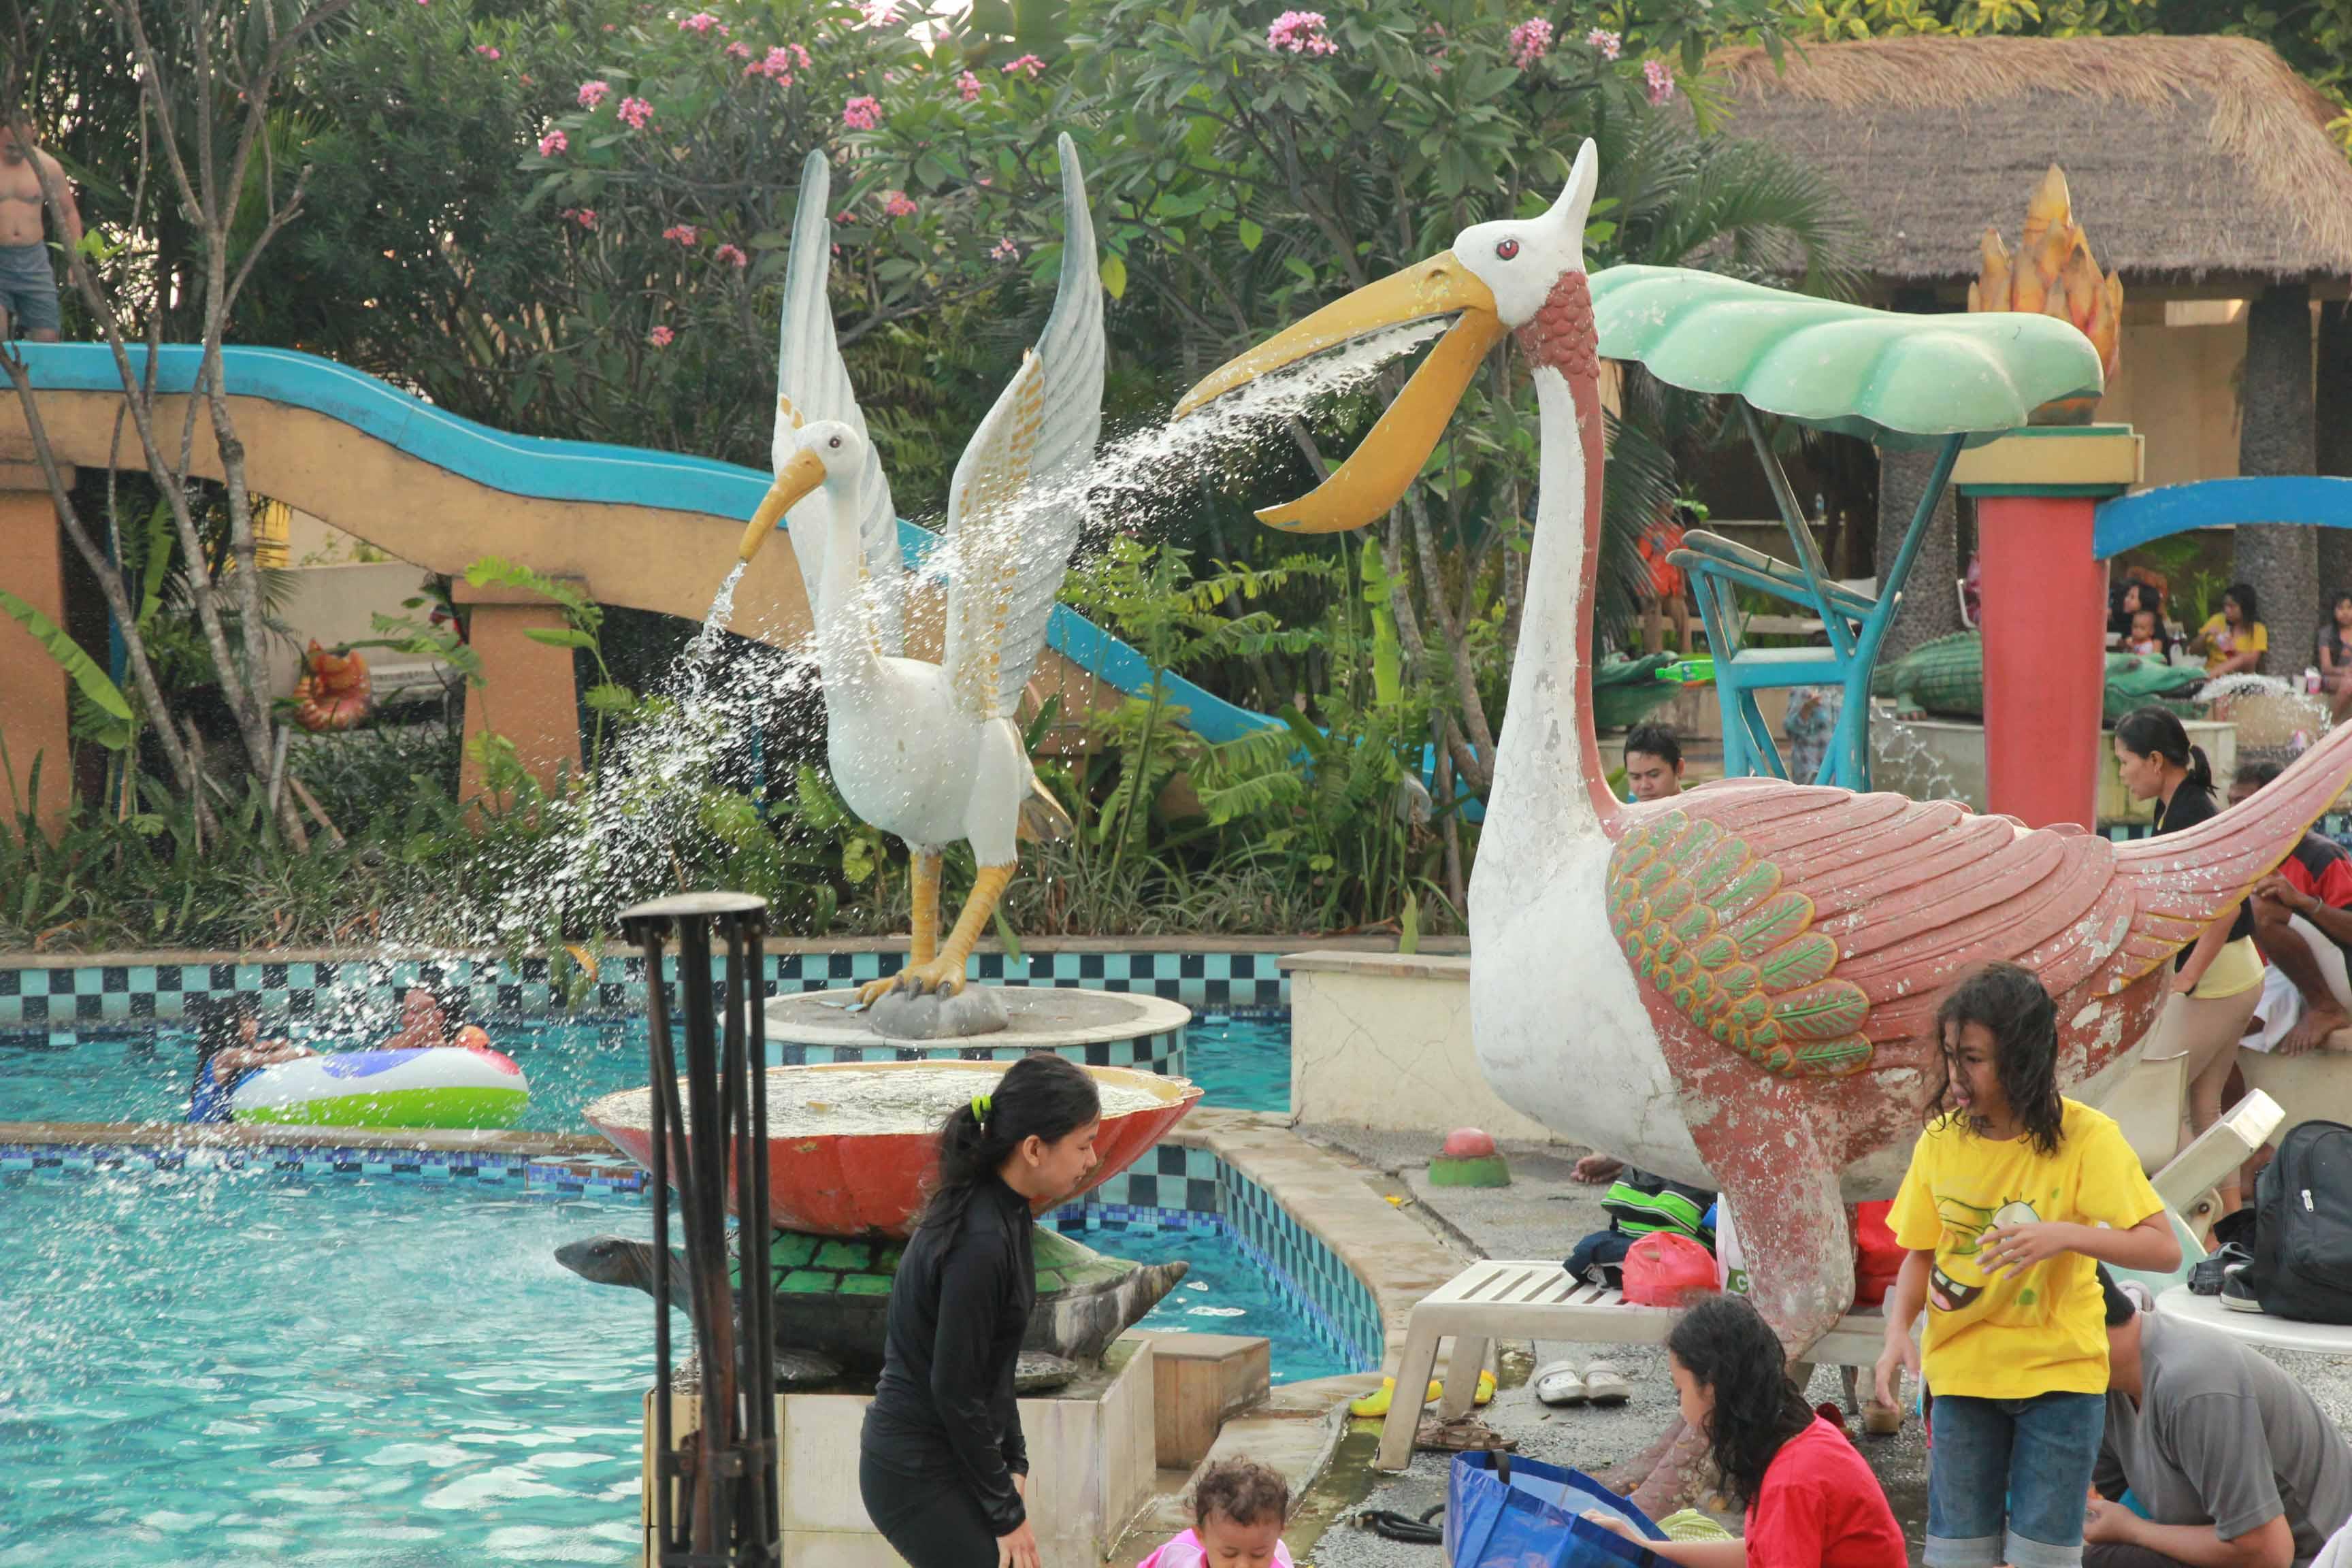 Marcopolo Adventure Waterpark Serpong Untold Contemplation Tiket Ocean Park Bsd Pancuran